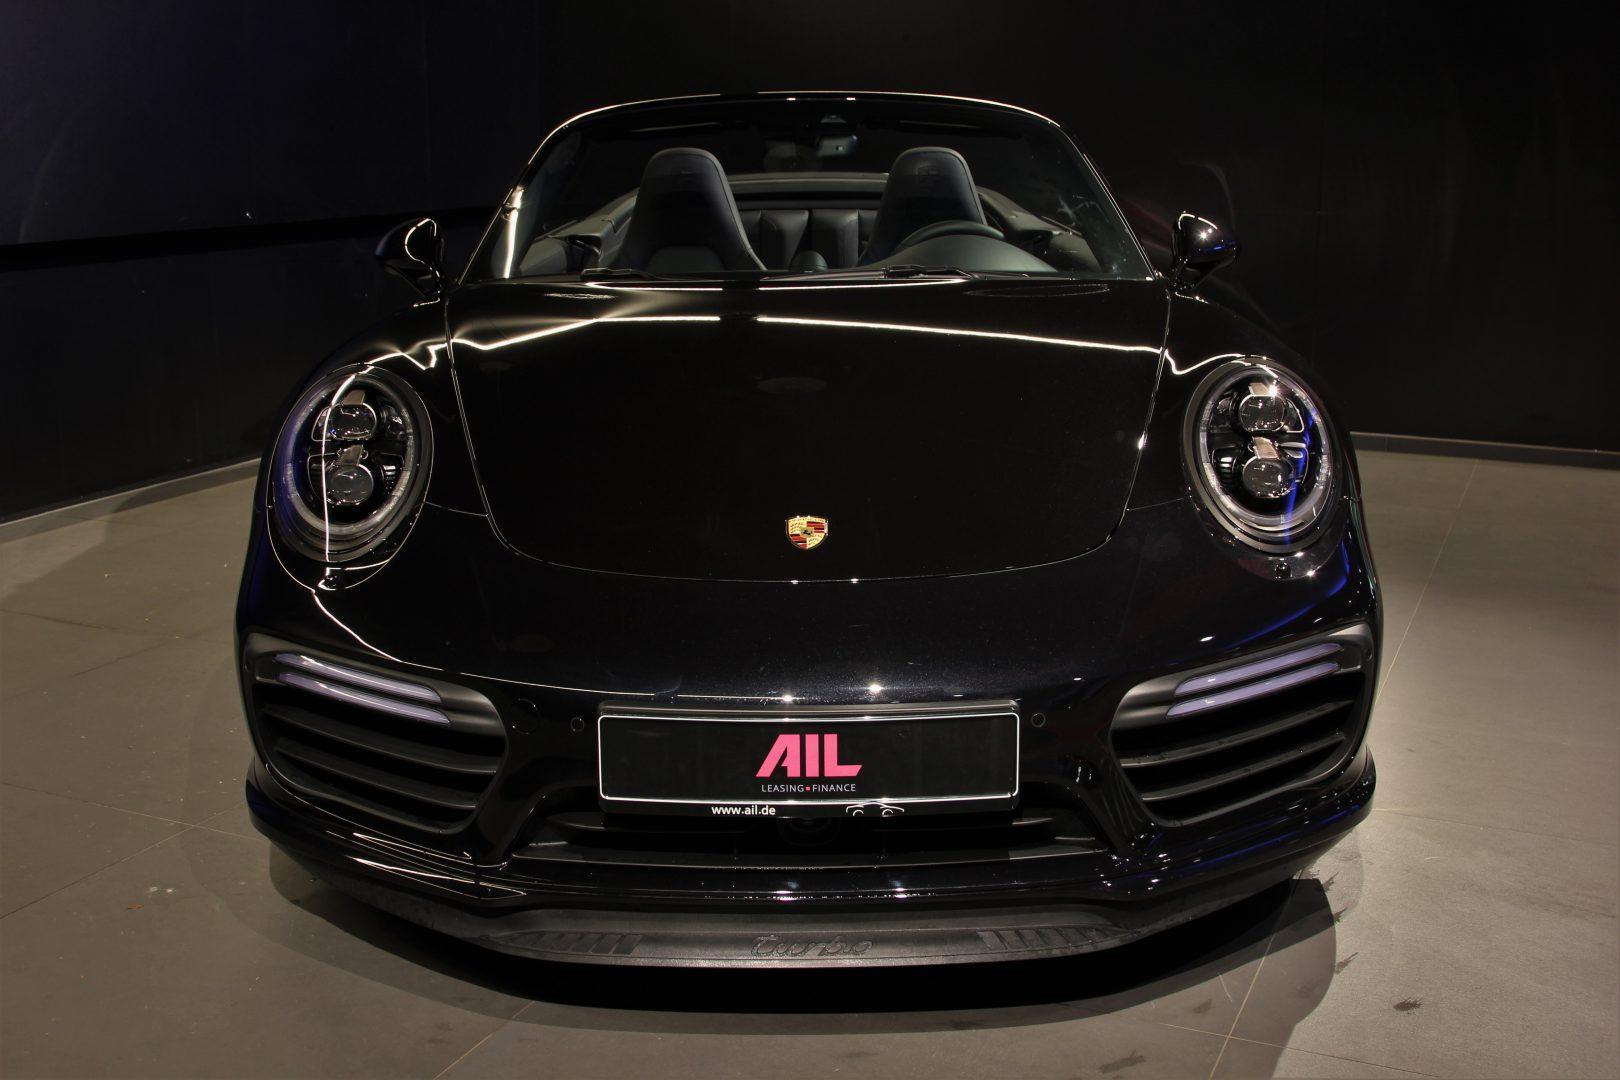 AIL Porsche 991 Turbo Lift LED DAB 7